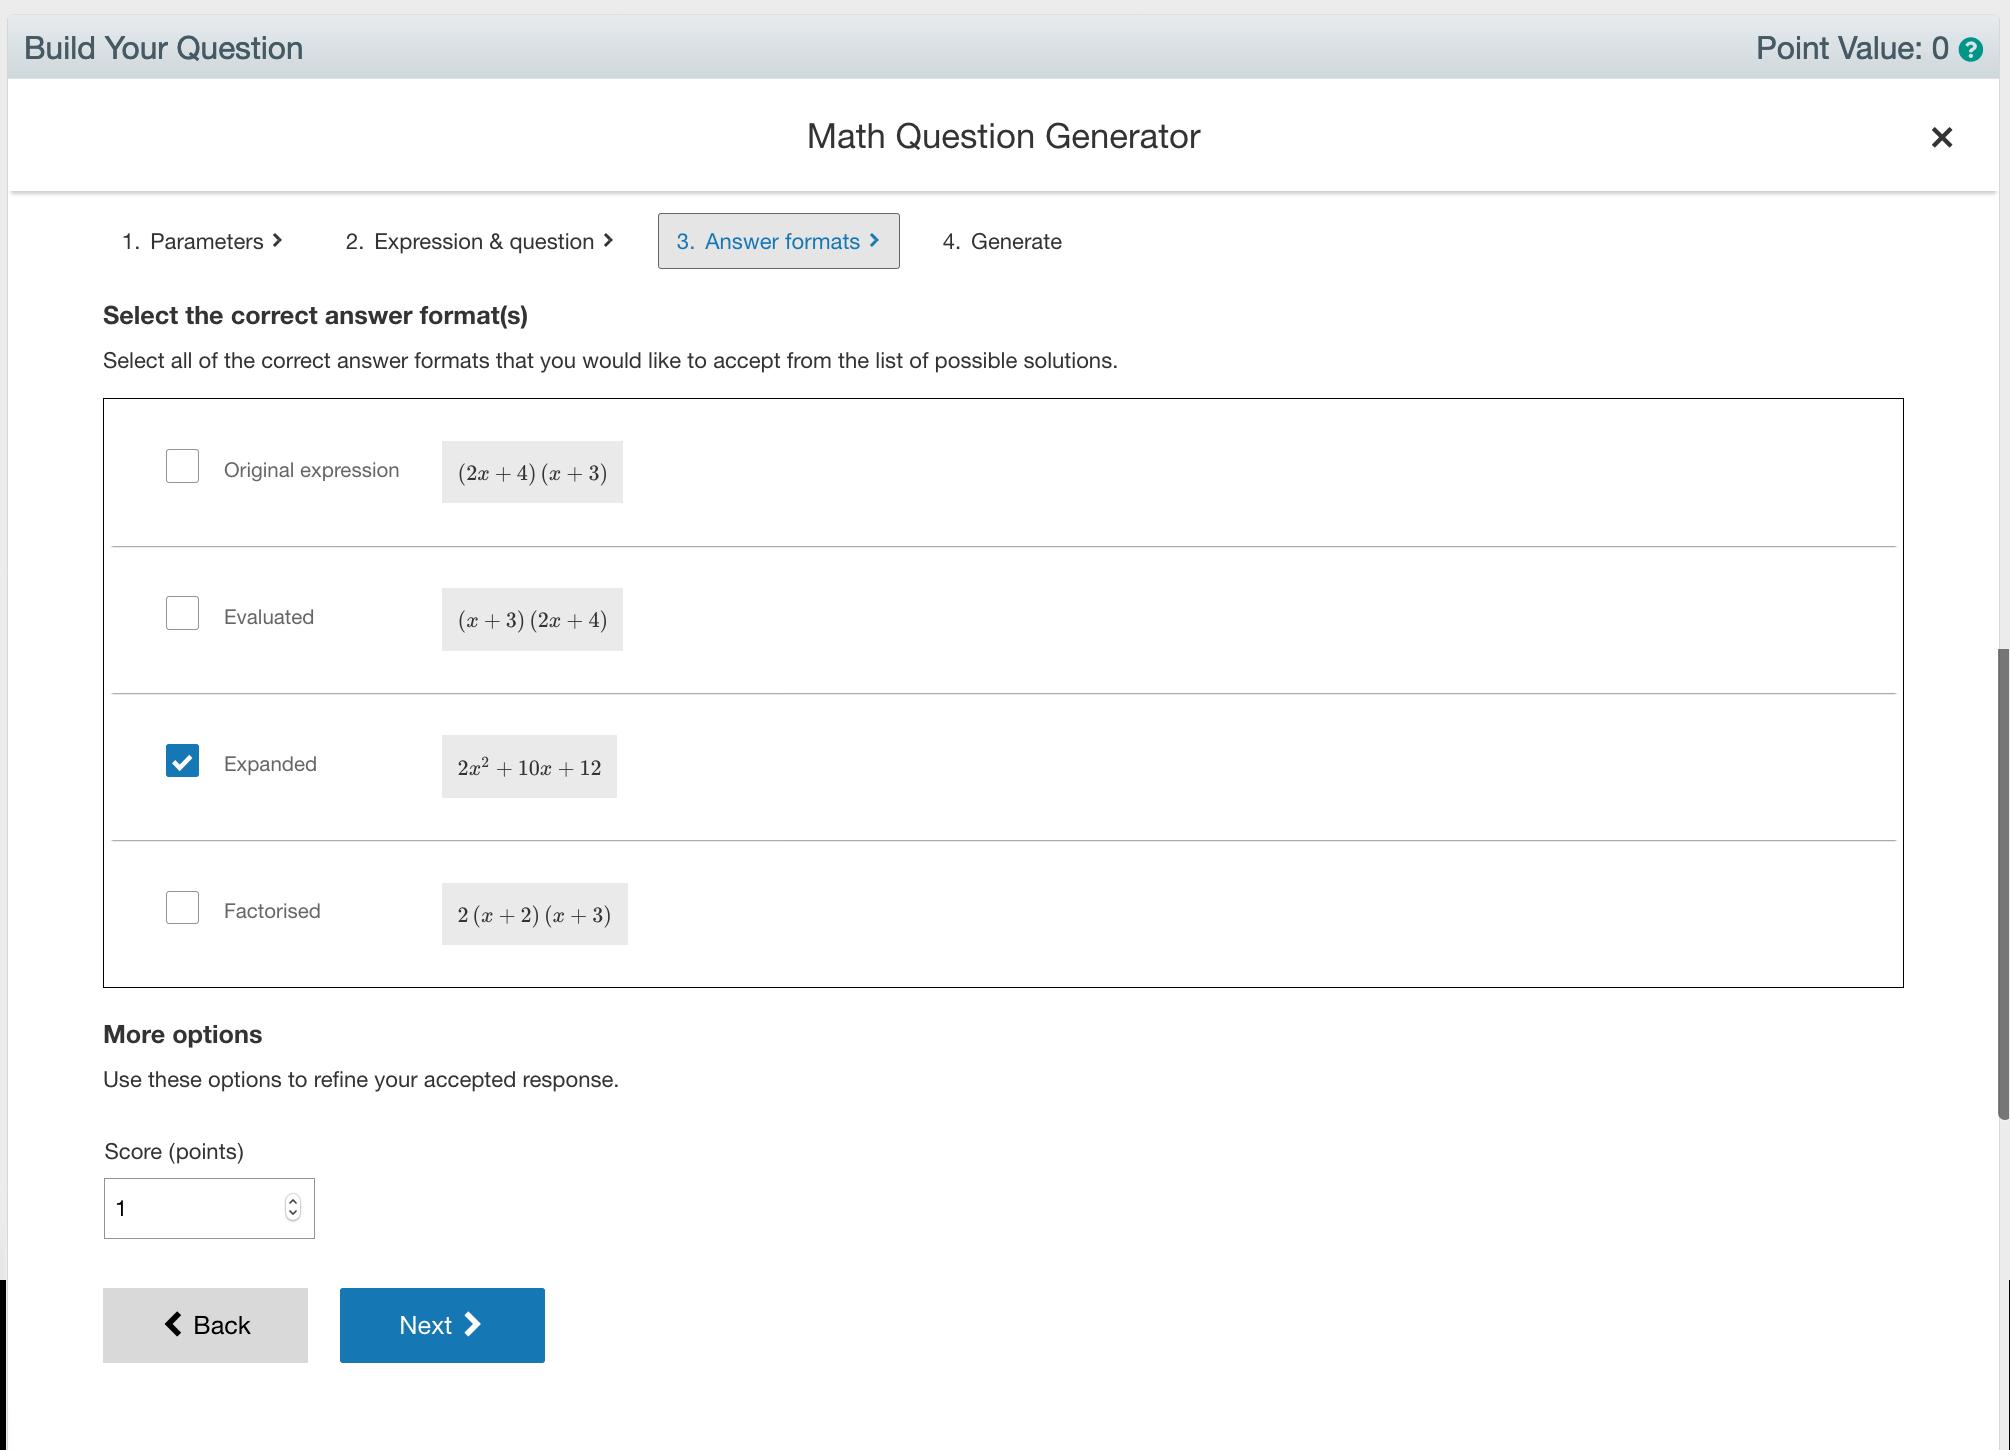 Math Question Generator Step 3